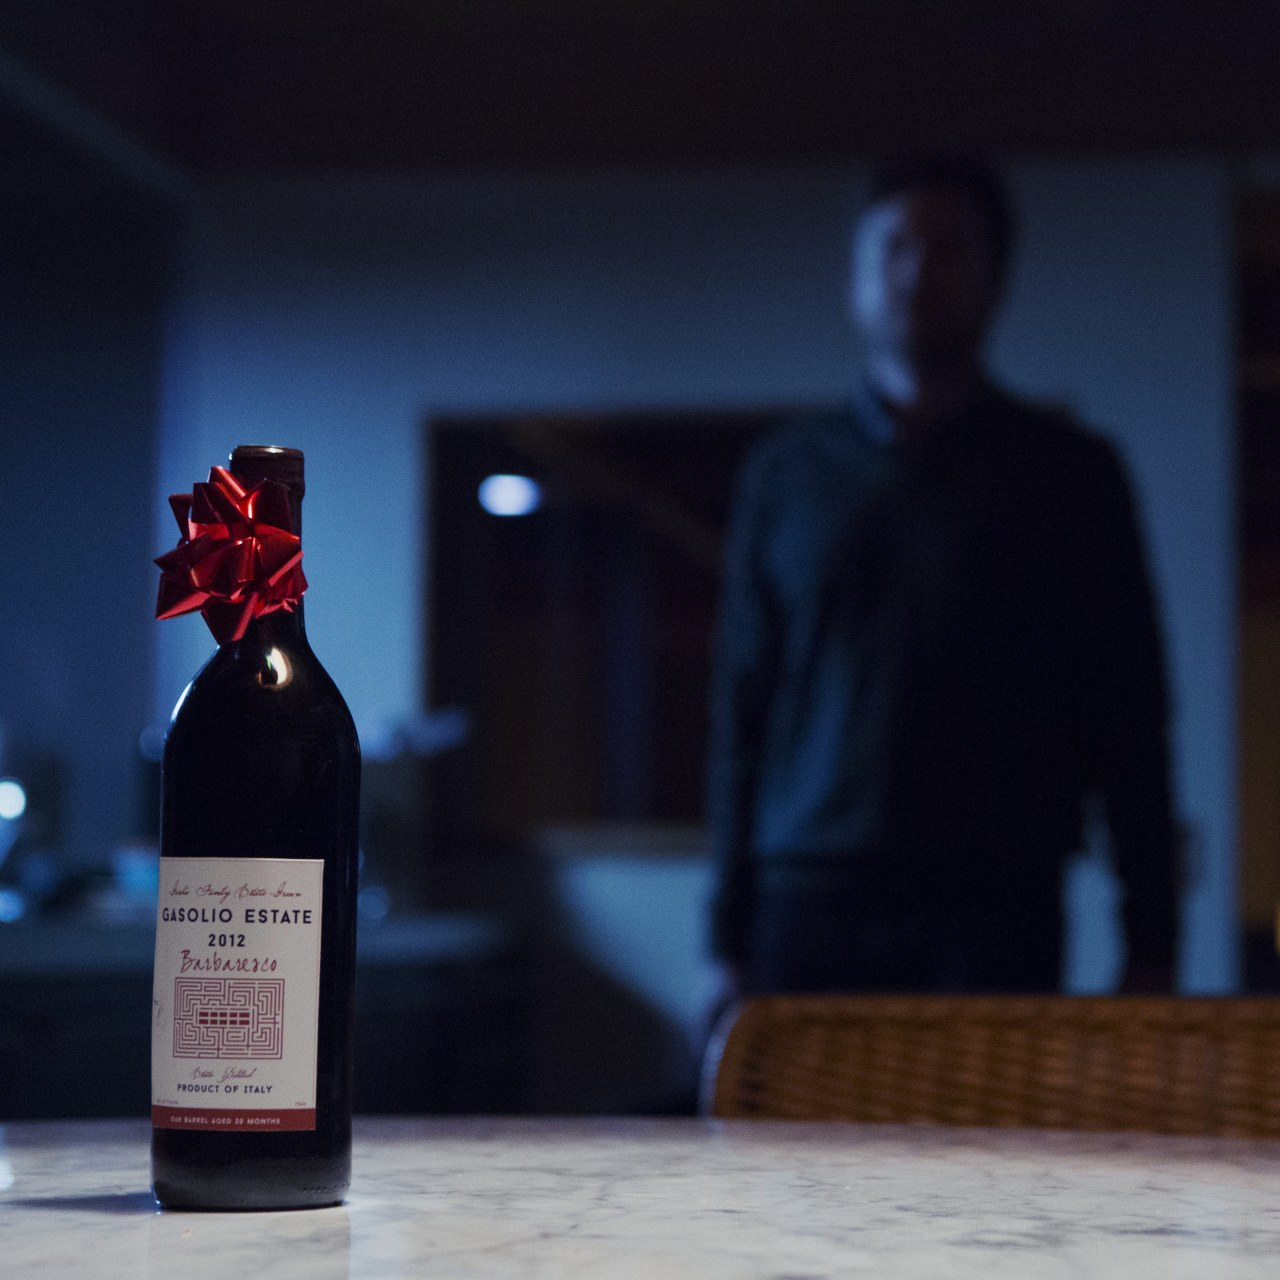 The Gift - Bild 9